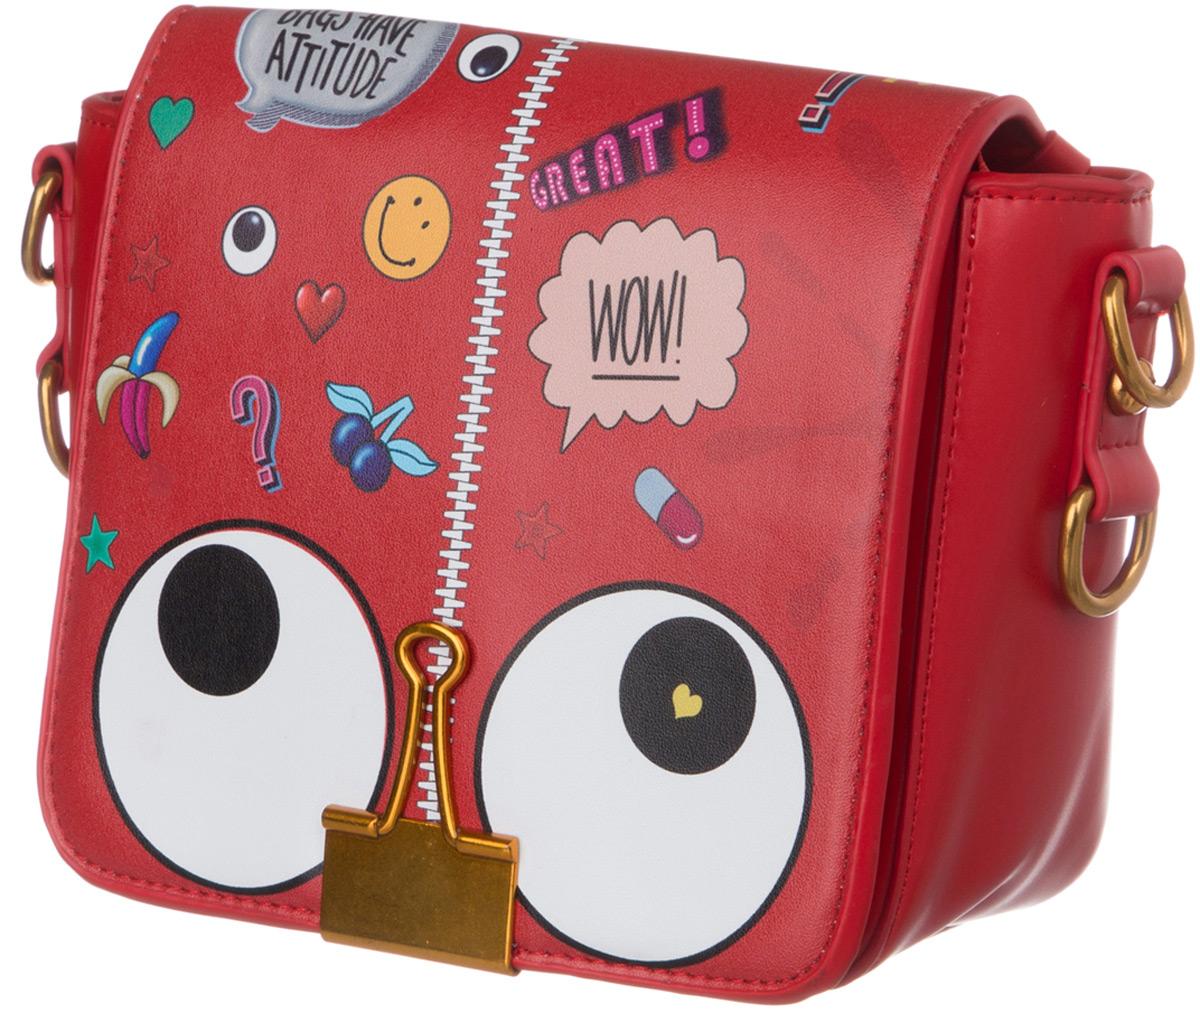 Сумка для девочки Vitacci, цвет: красный. BG02010 сумка для девочки vitacci цвет черный 1000000704